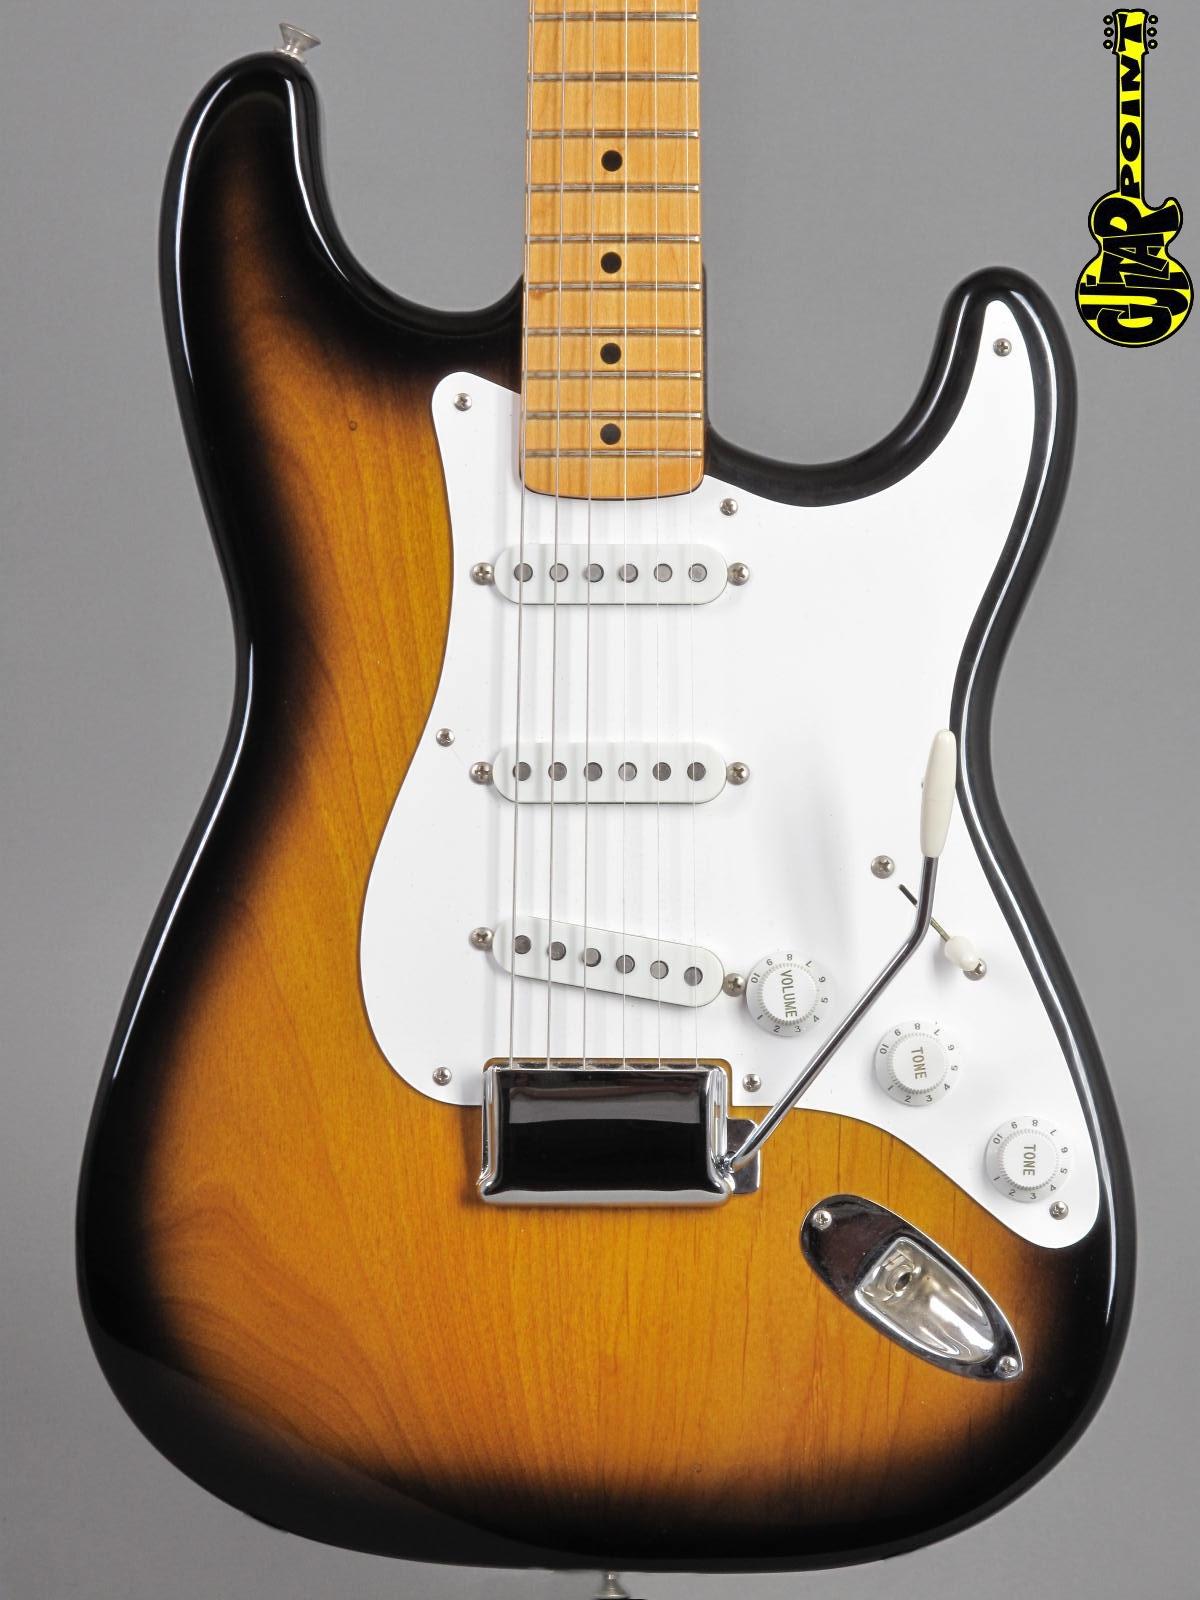 1987 Fender American Vintage '57 Reissue Stratocaster - 2-tone Sunburst + Case Candy !